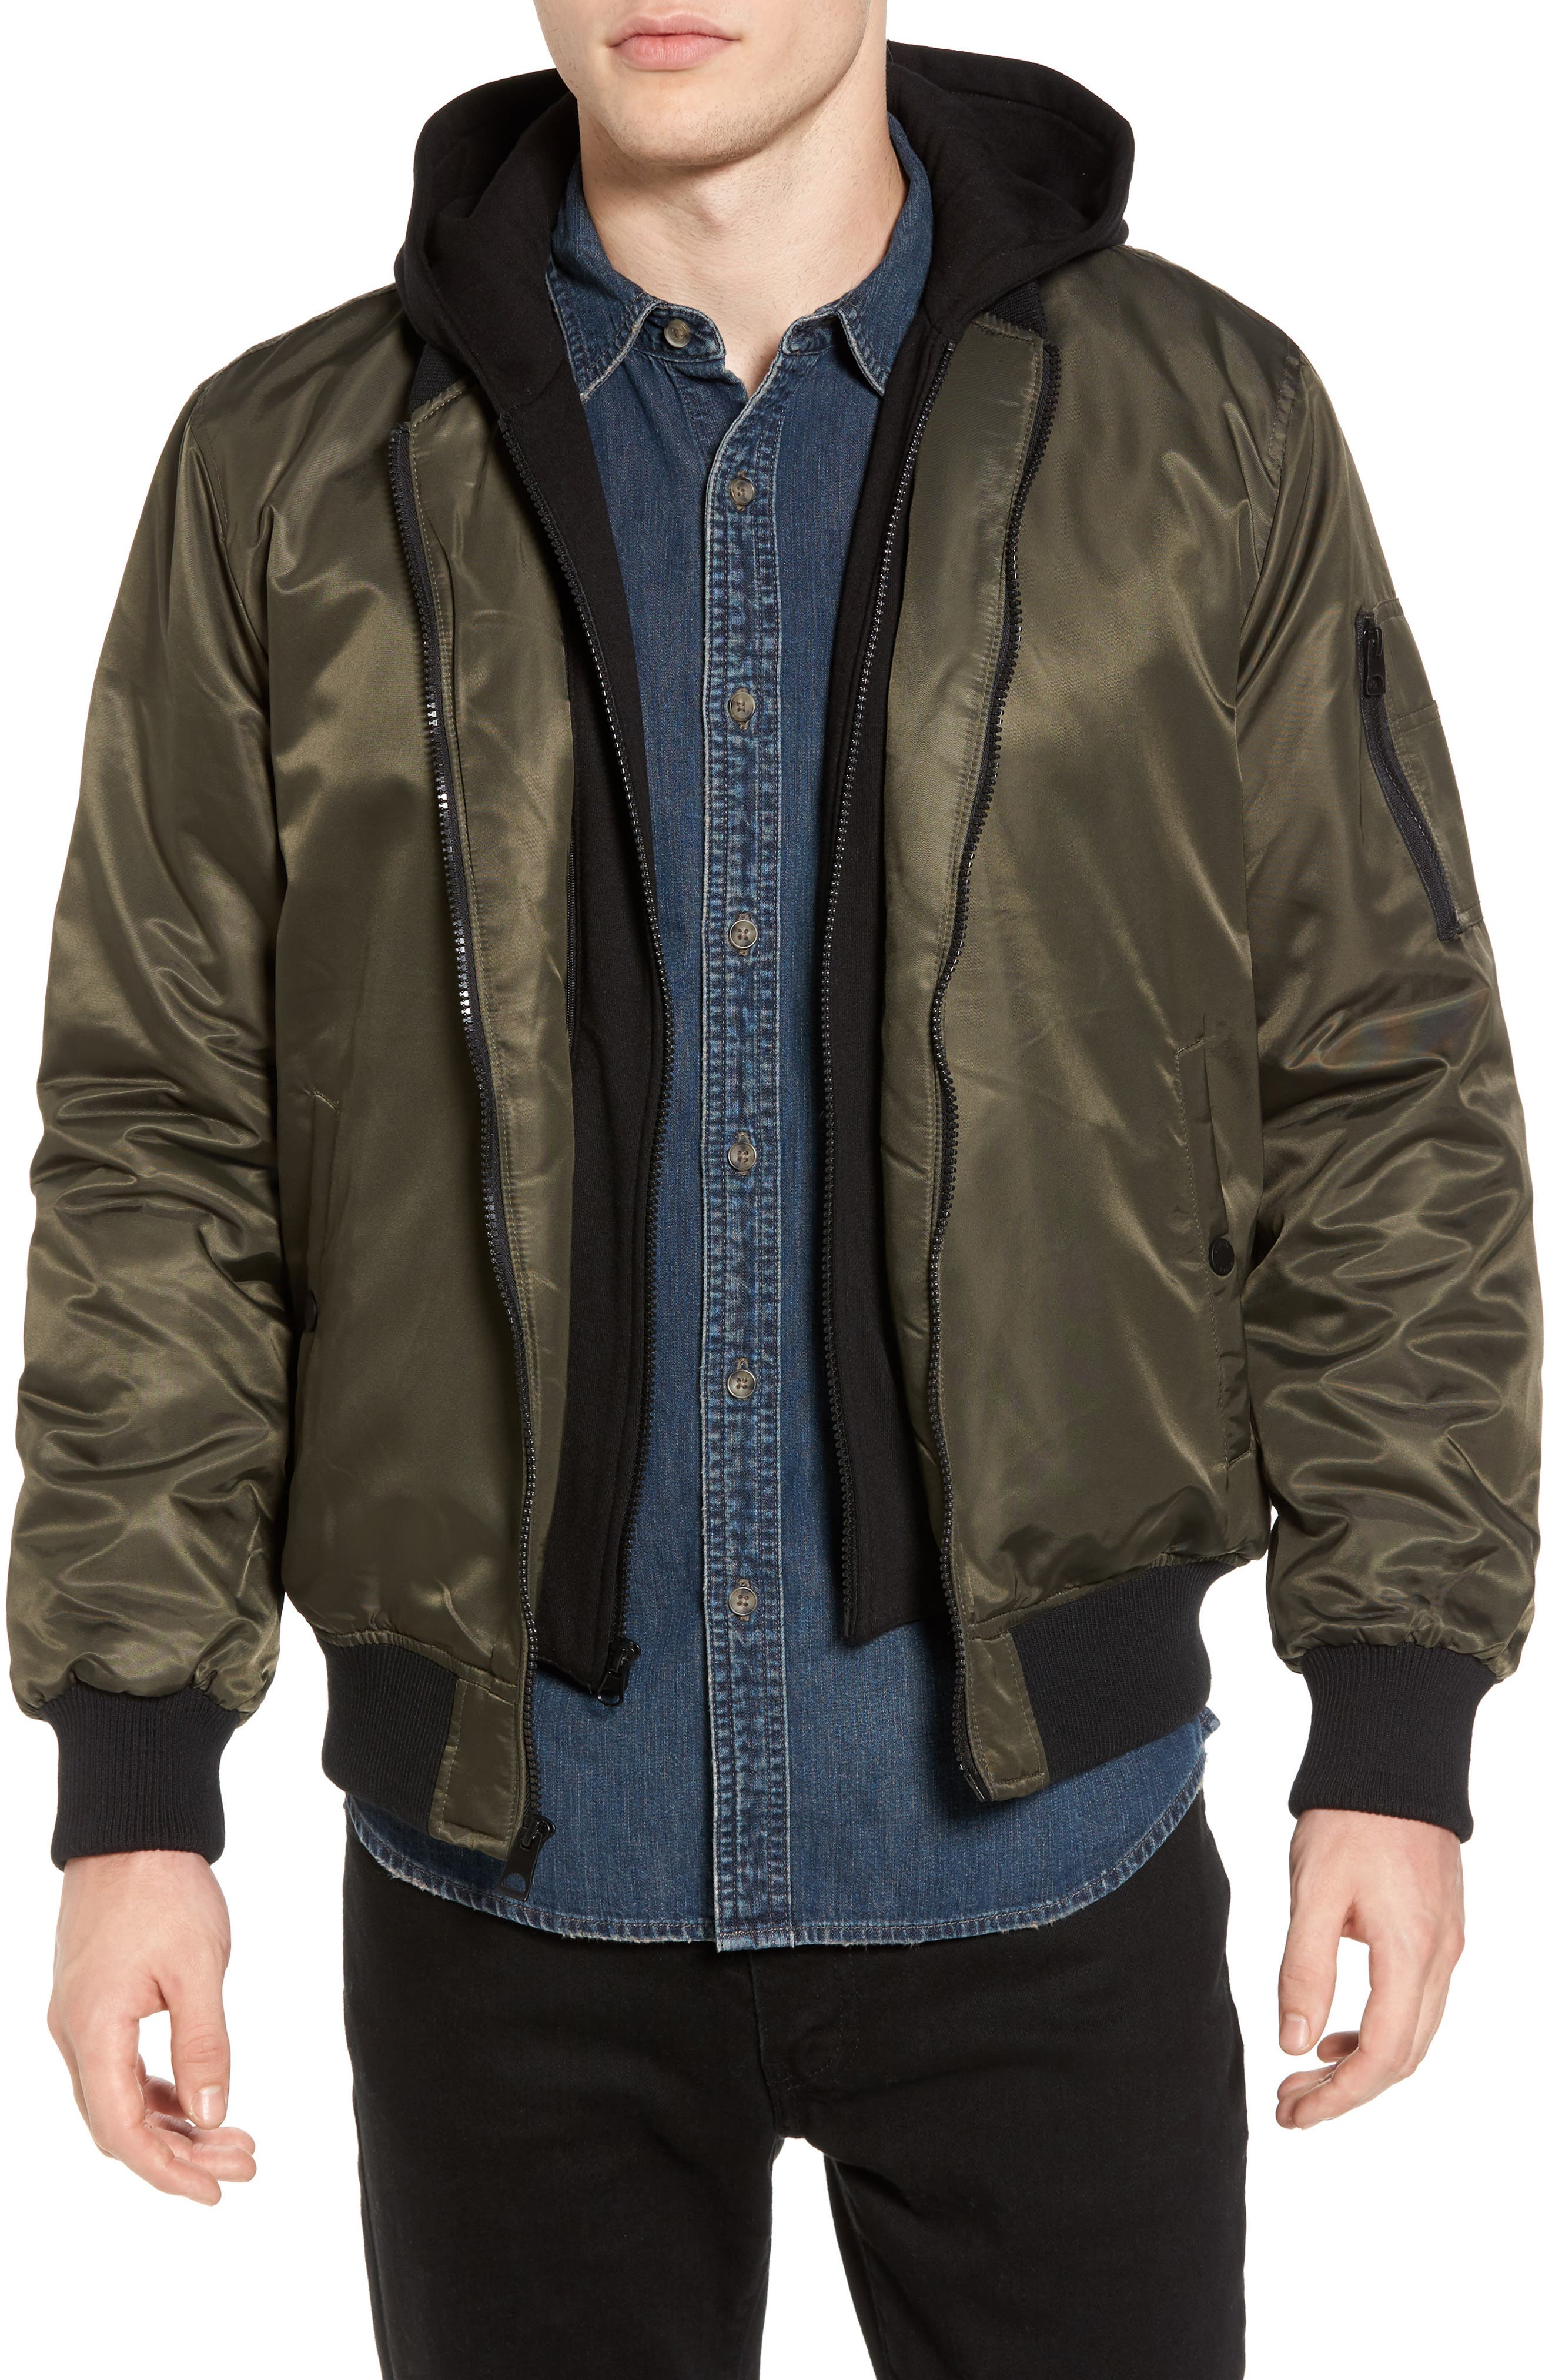 Black Rivet Water Resistant Hooded Satin Flight Jacket